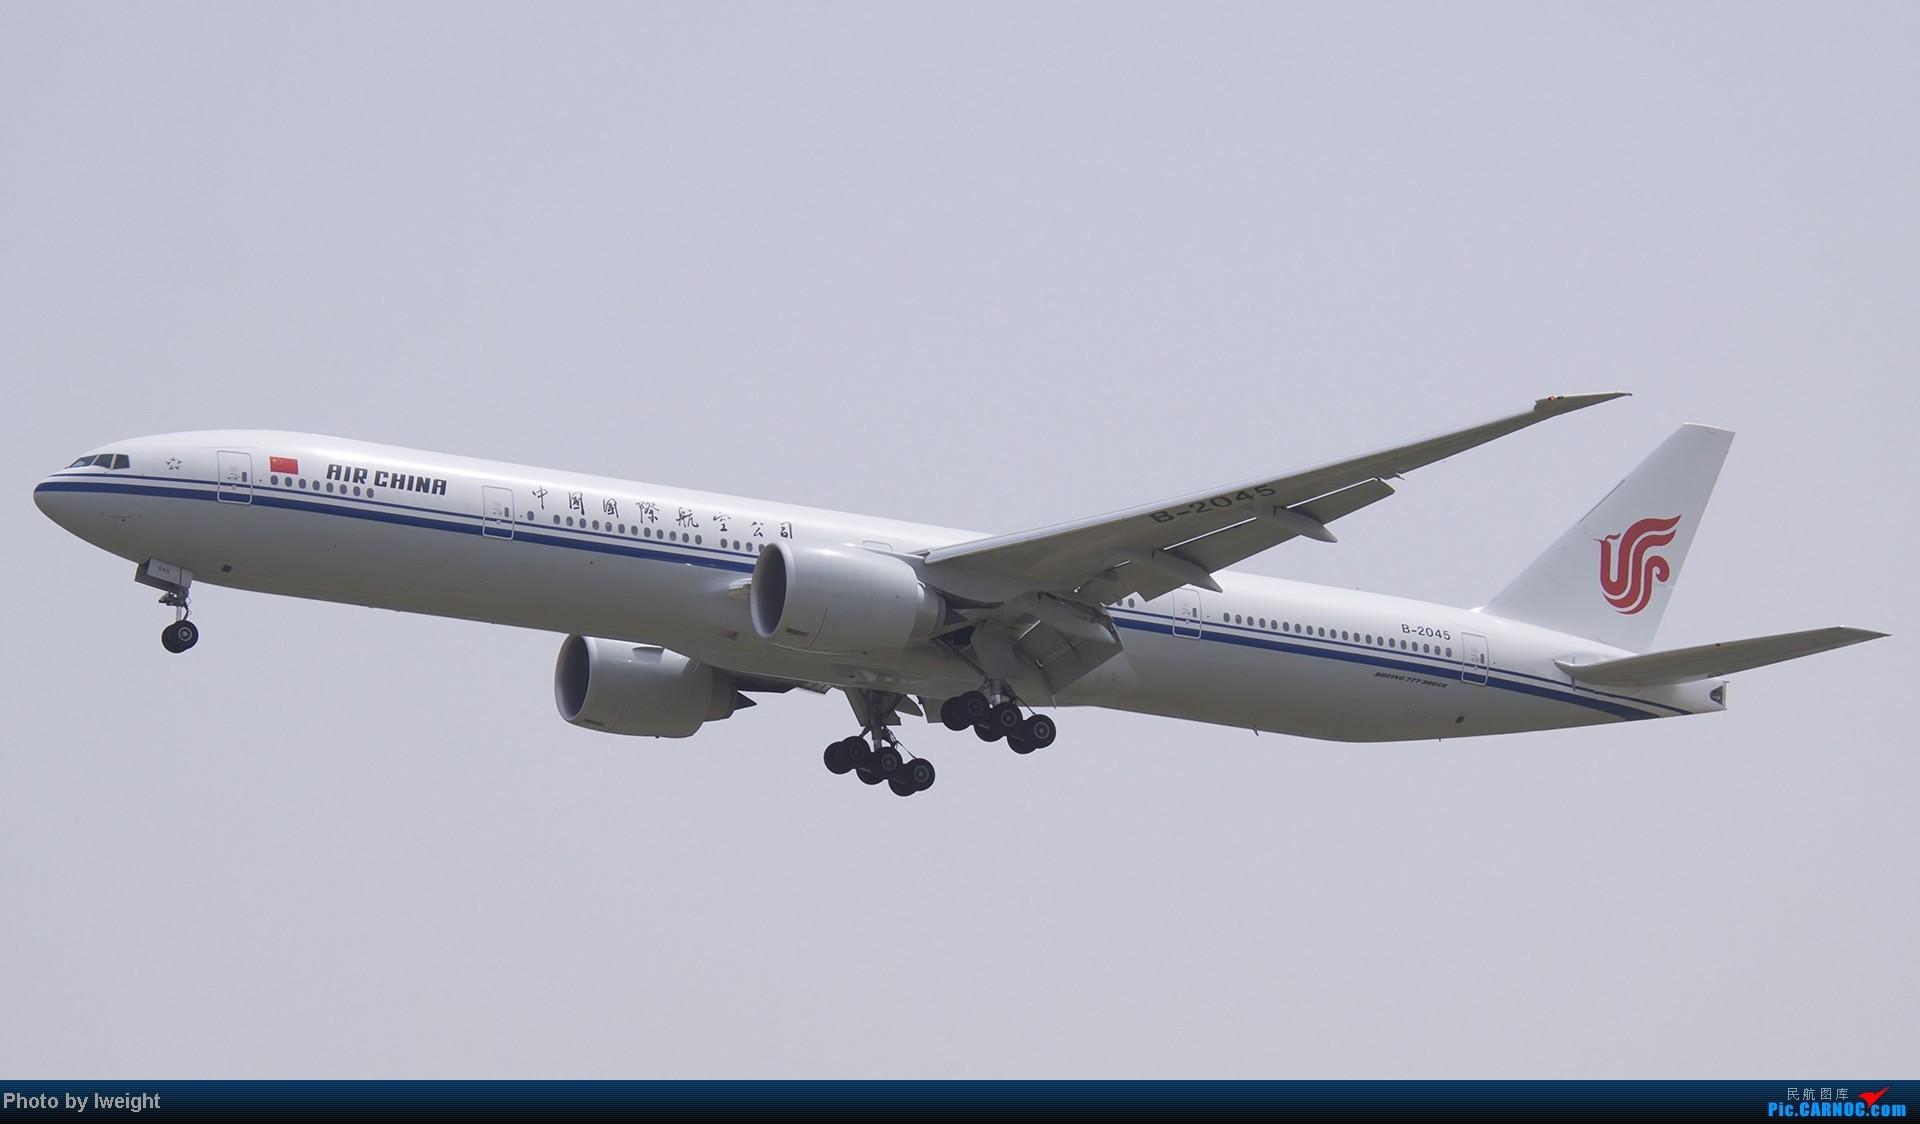 Re:[原创]霾天首都机场随拍 BOEING 777-300 B-2045 中国北京首都机场